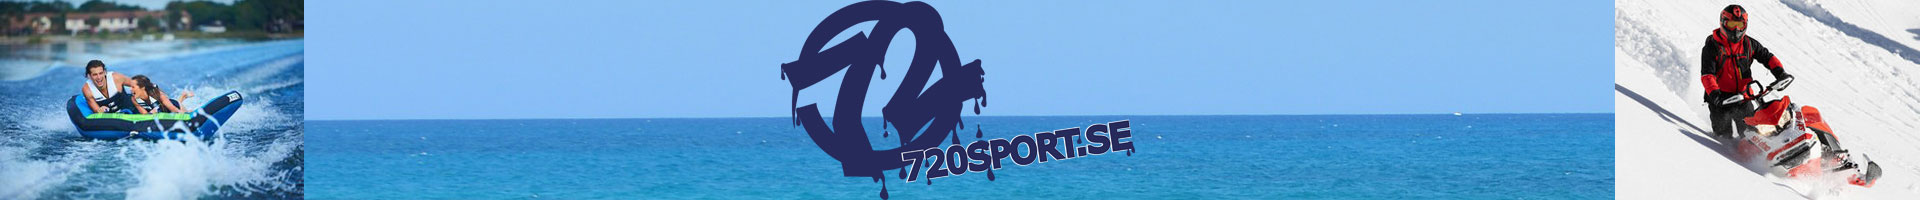 Banner 720sport.se